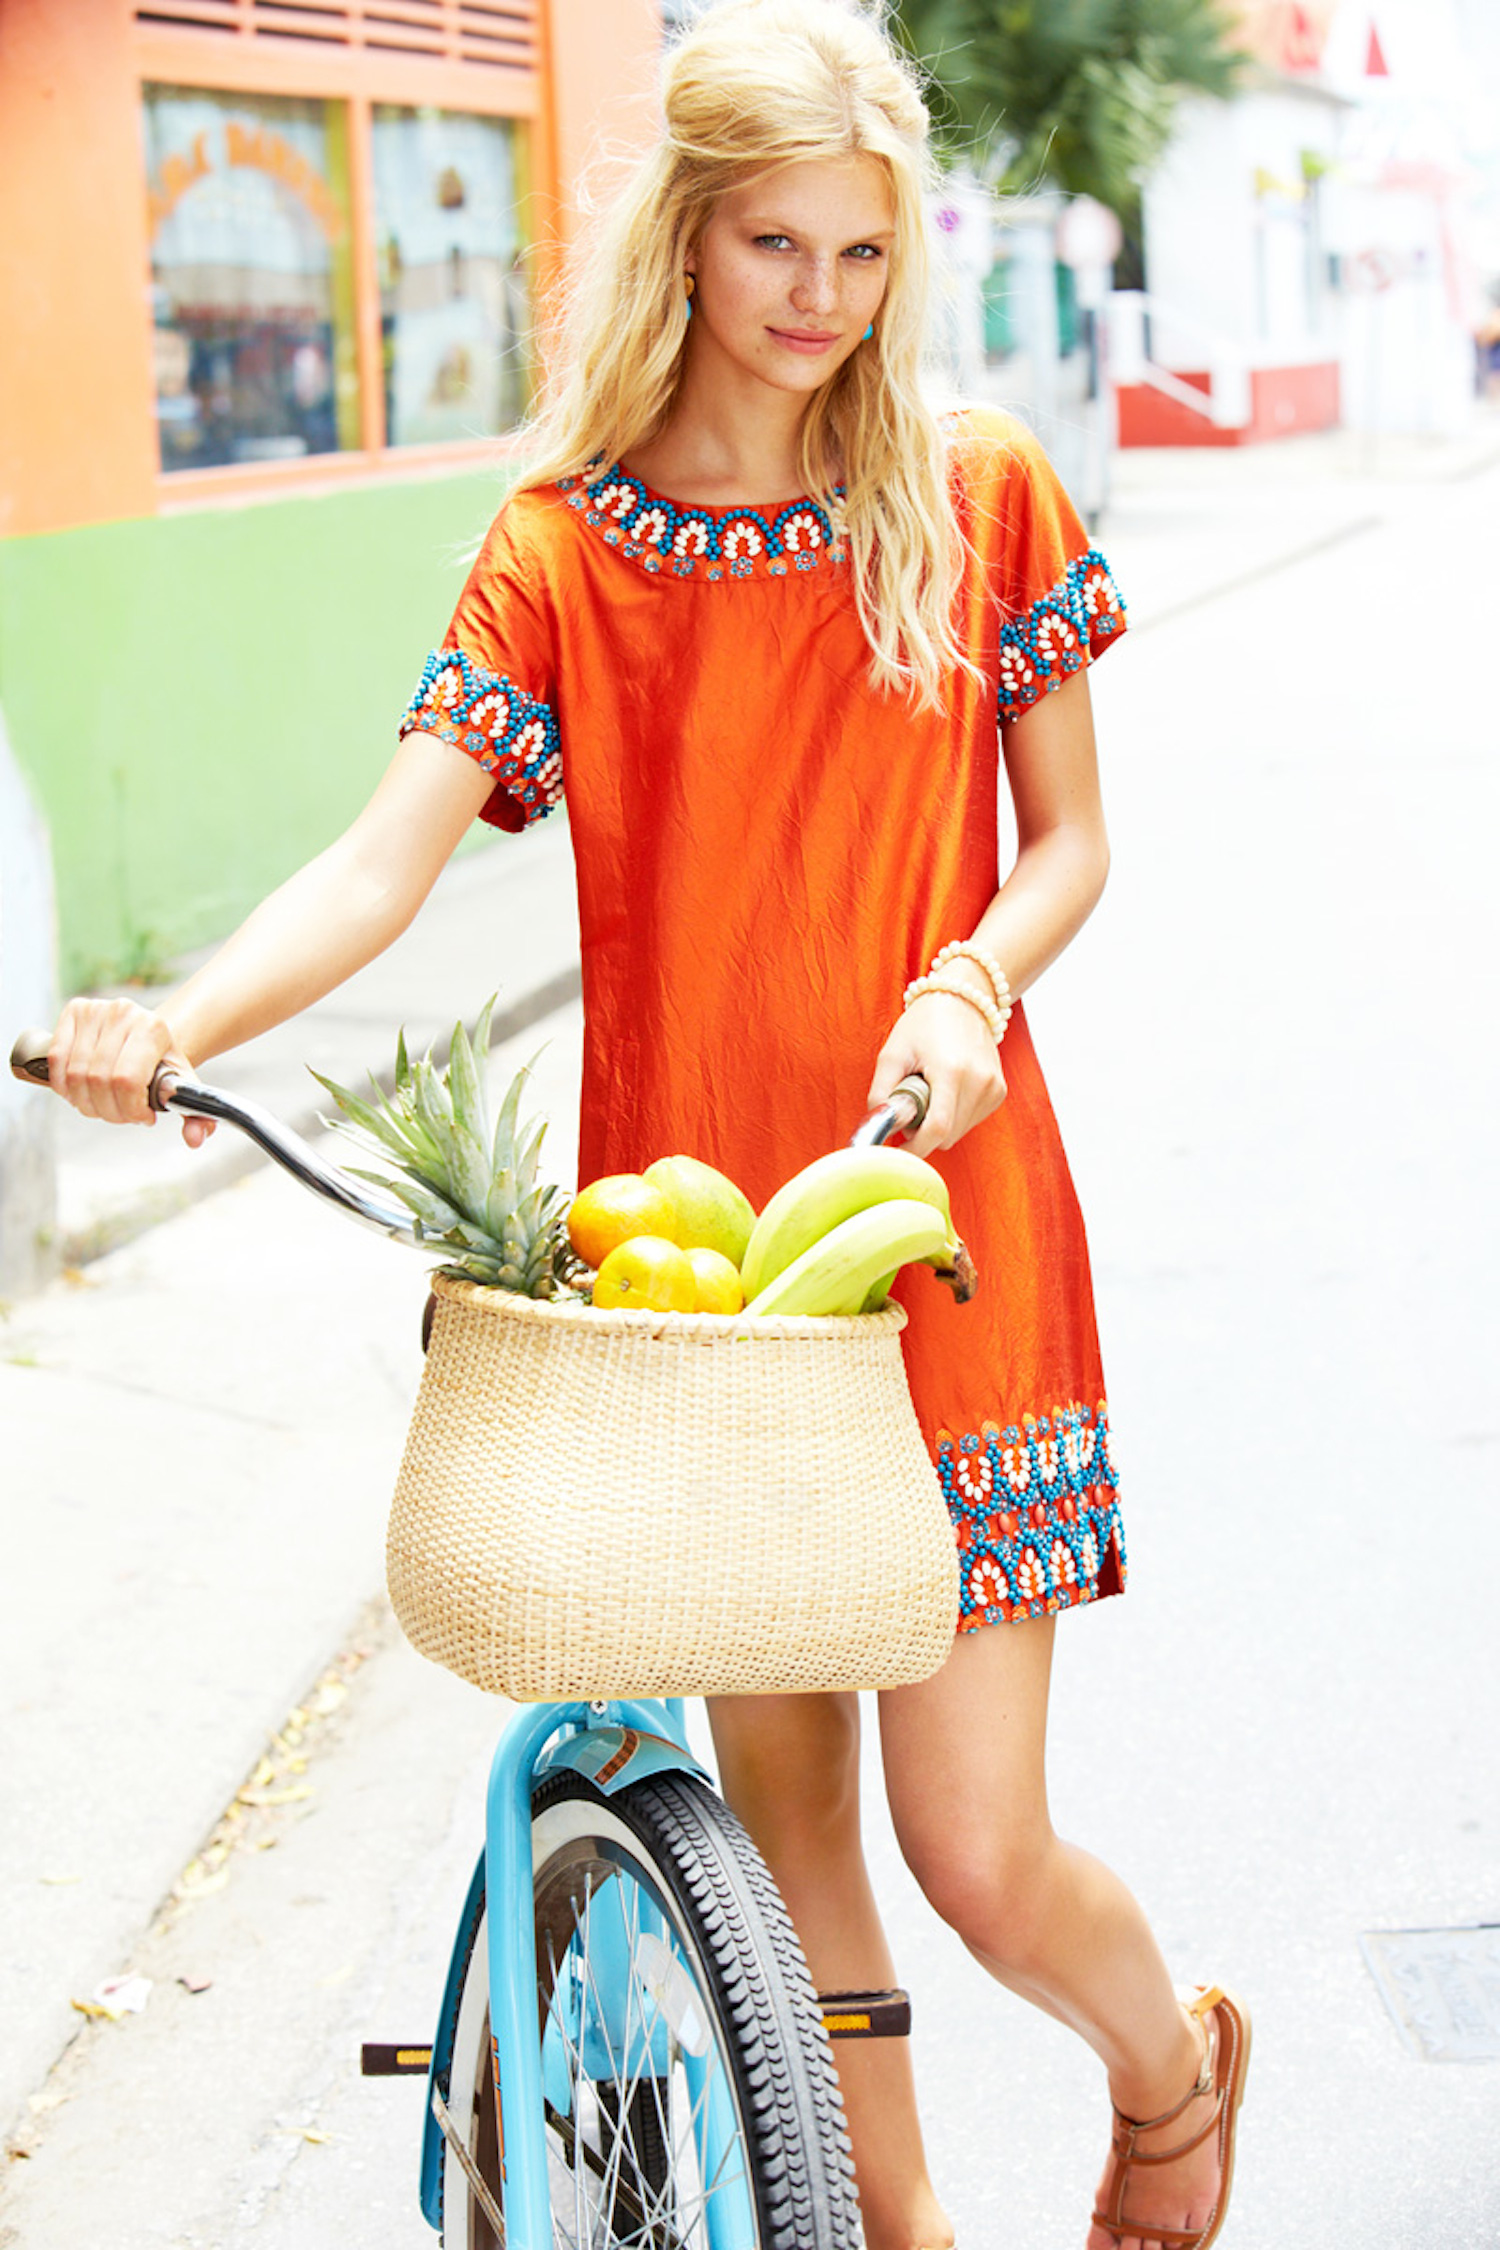 Orange_2186_A copy.jpg